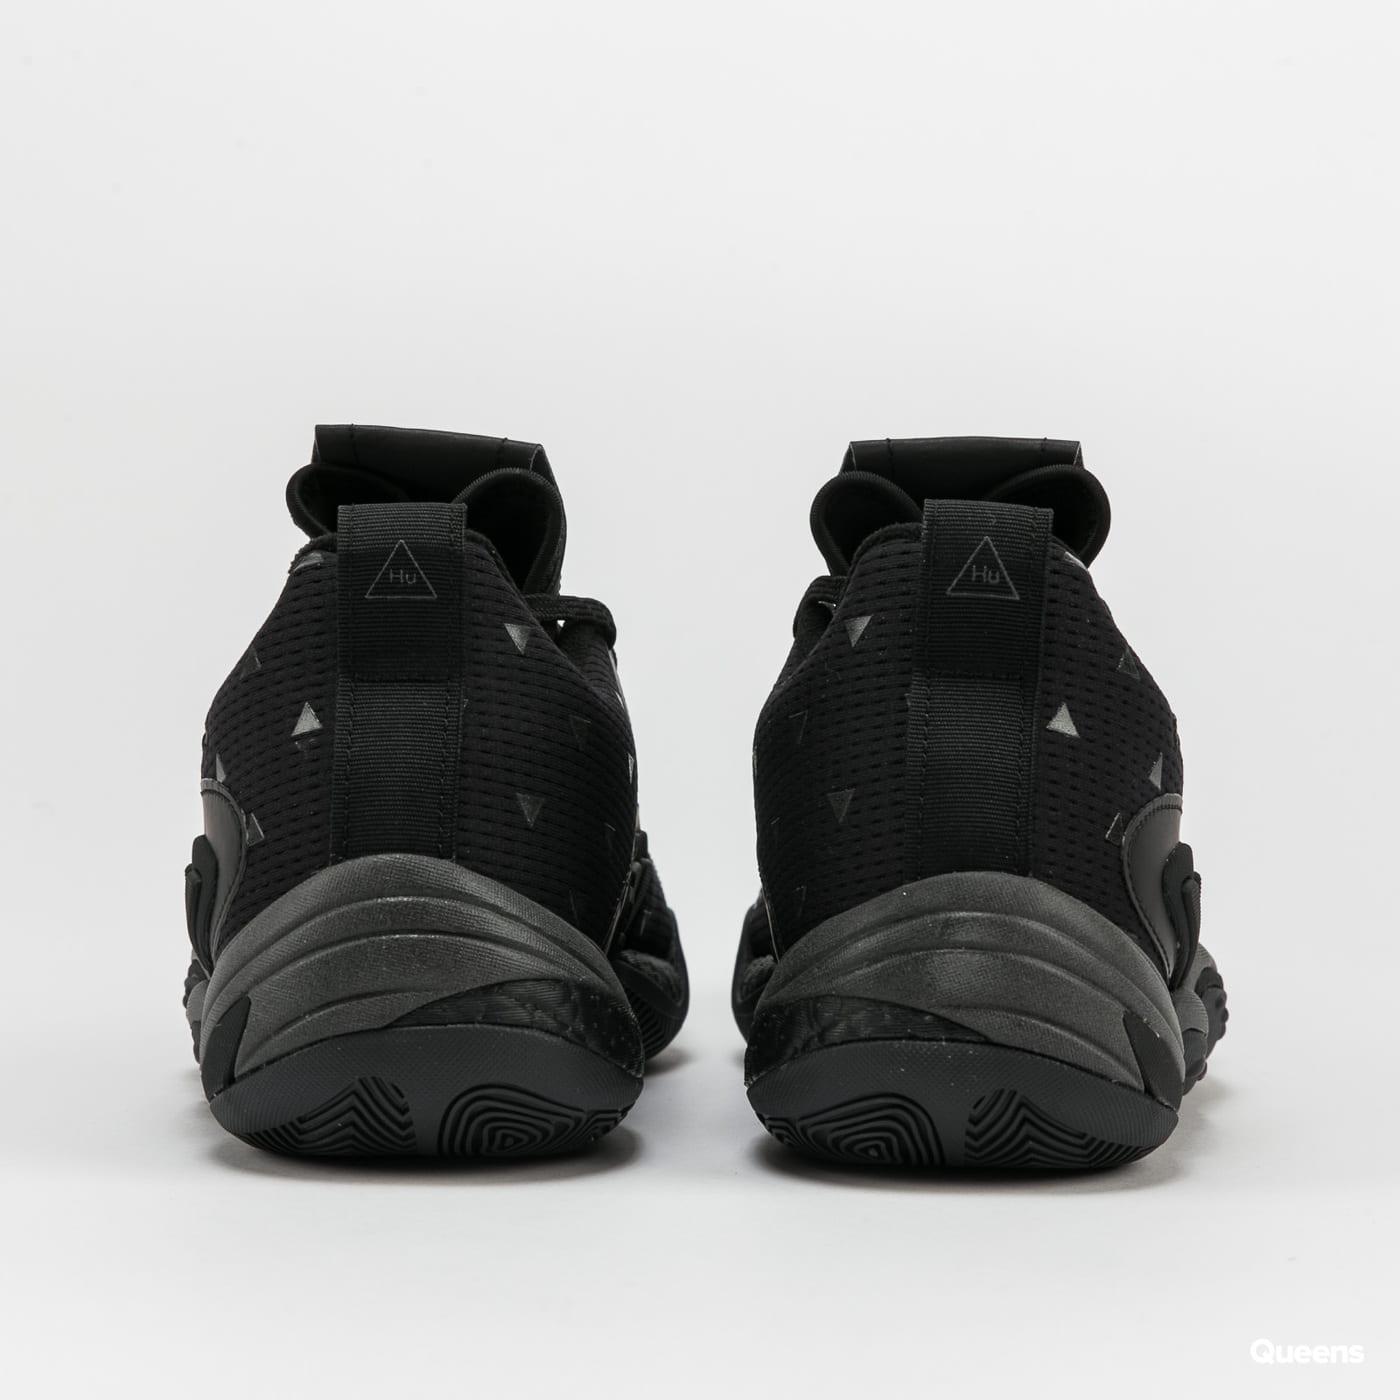 adidas Performance Crazy BYW 2.0 cblack / cblack / cblack